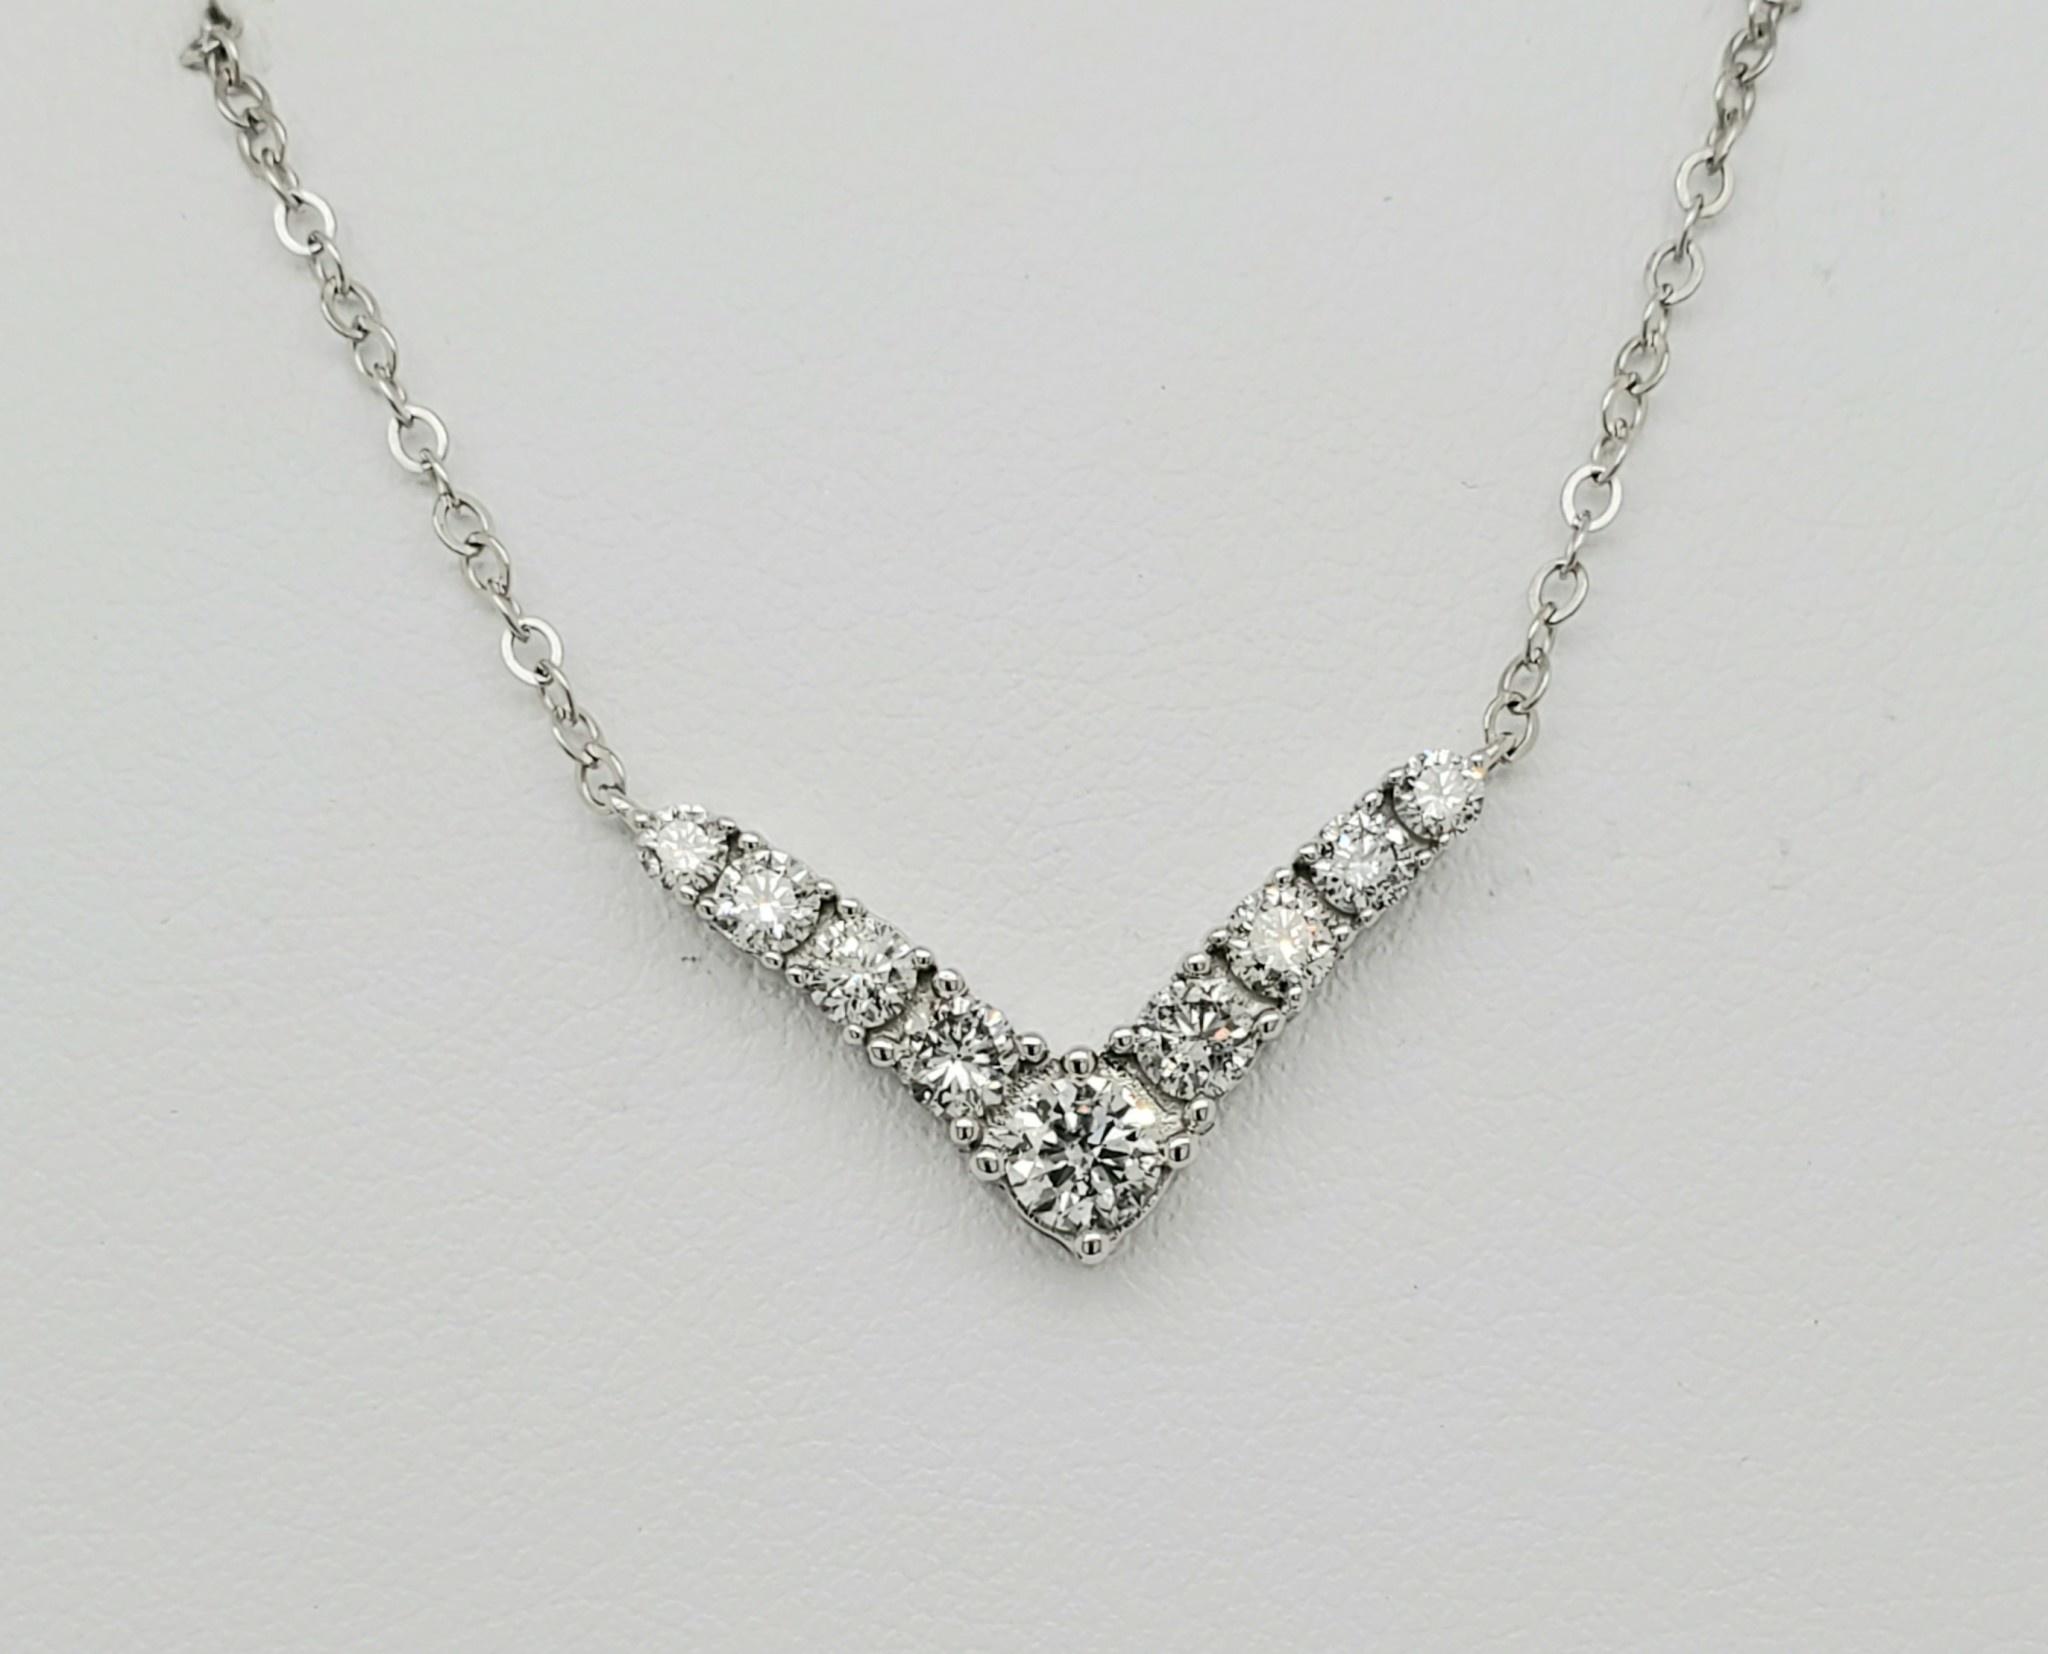 14KT WG Diamond V Necklace 0.60 CTTW